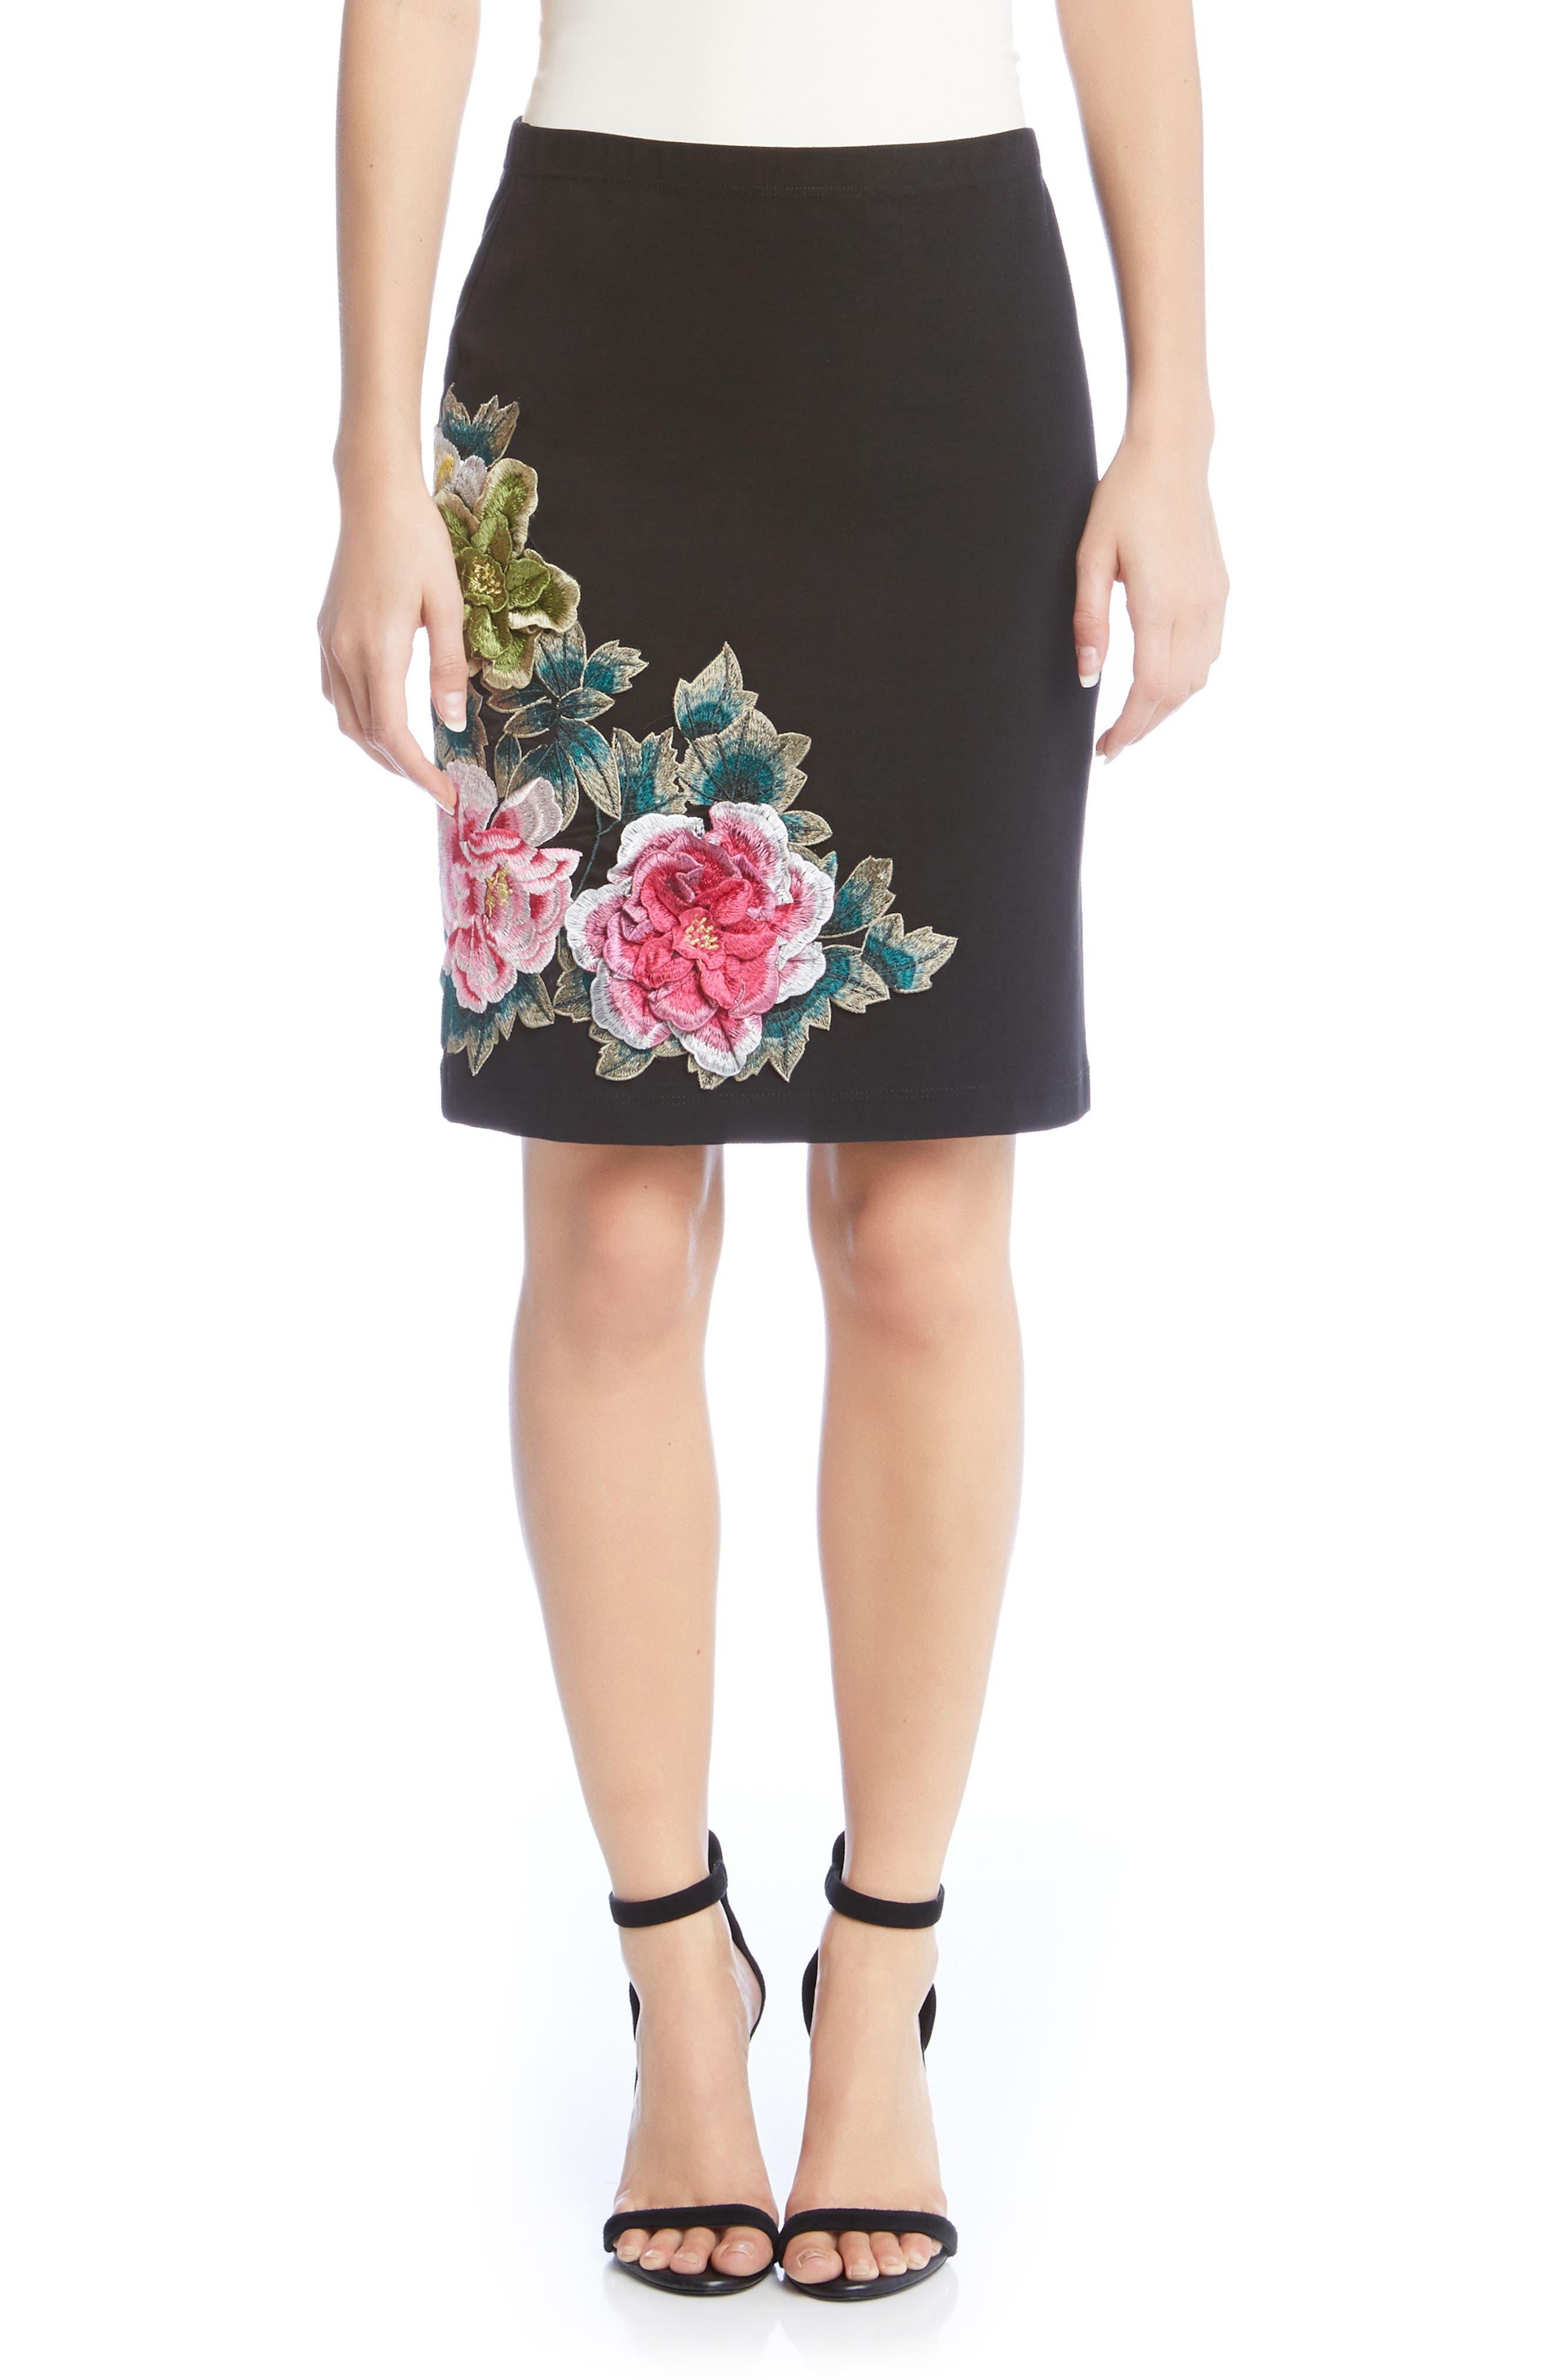 Alternate Image 1 Selected - Karen Kane Textured Floral Skirt